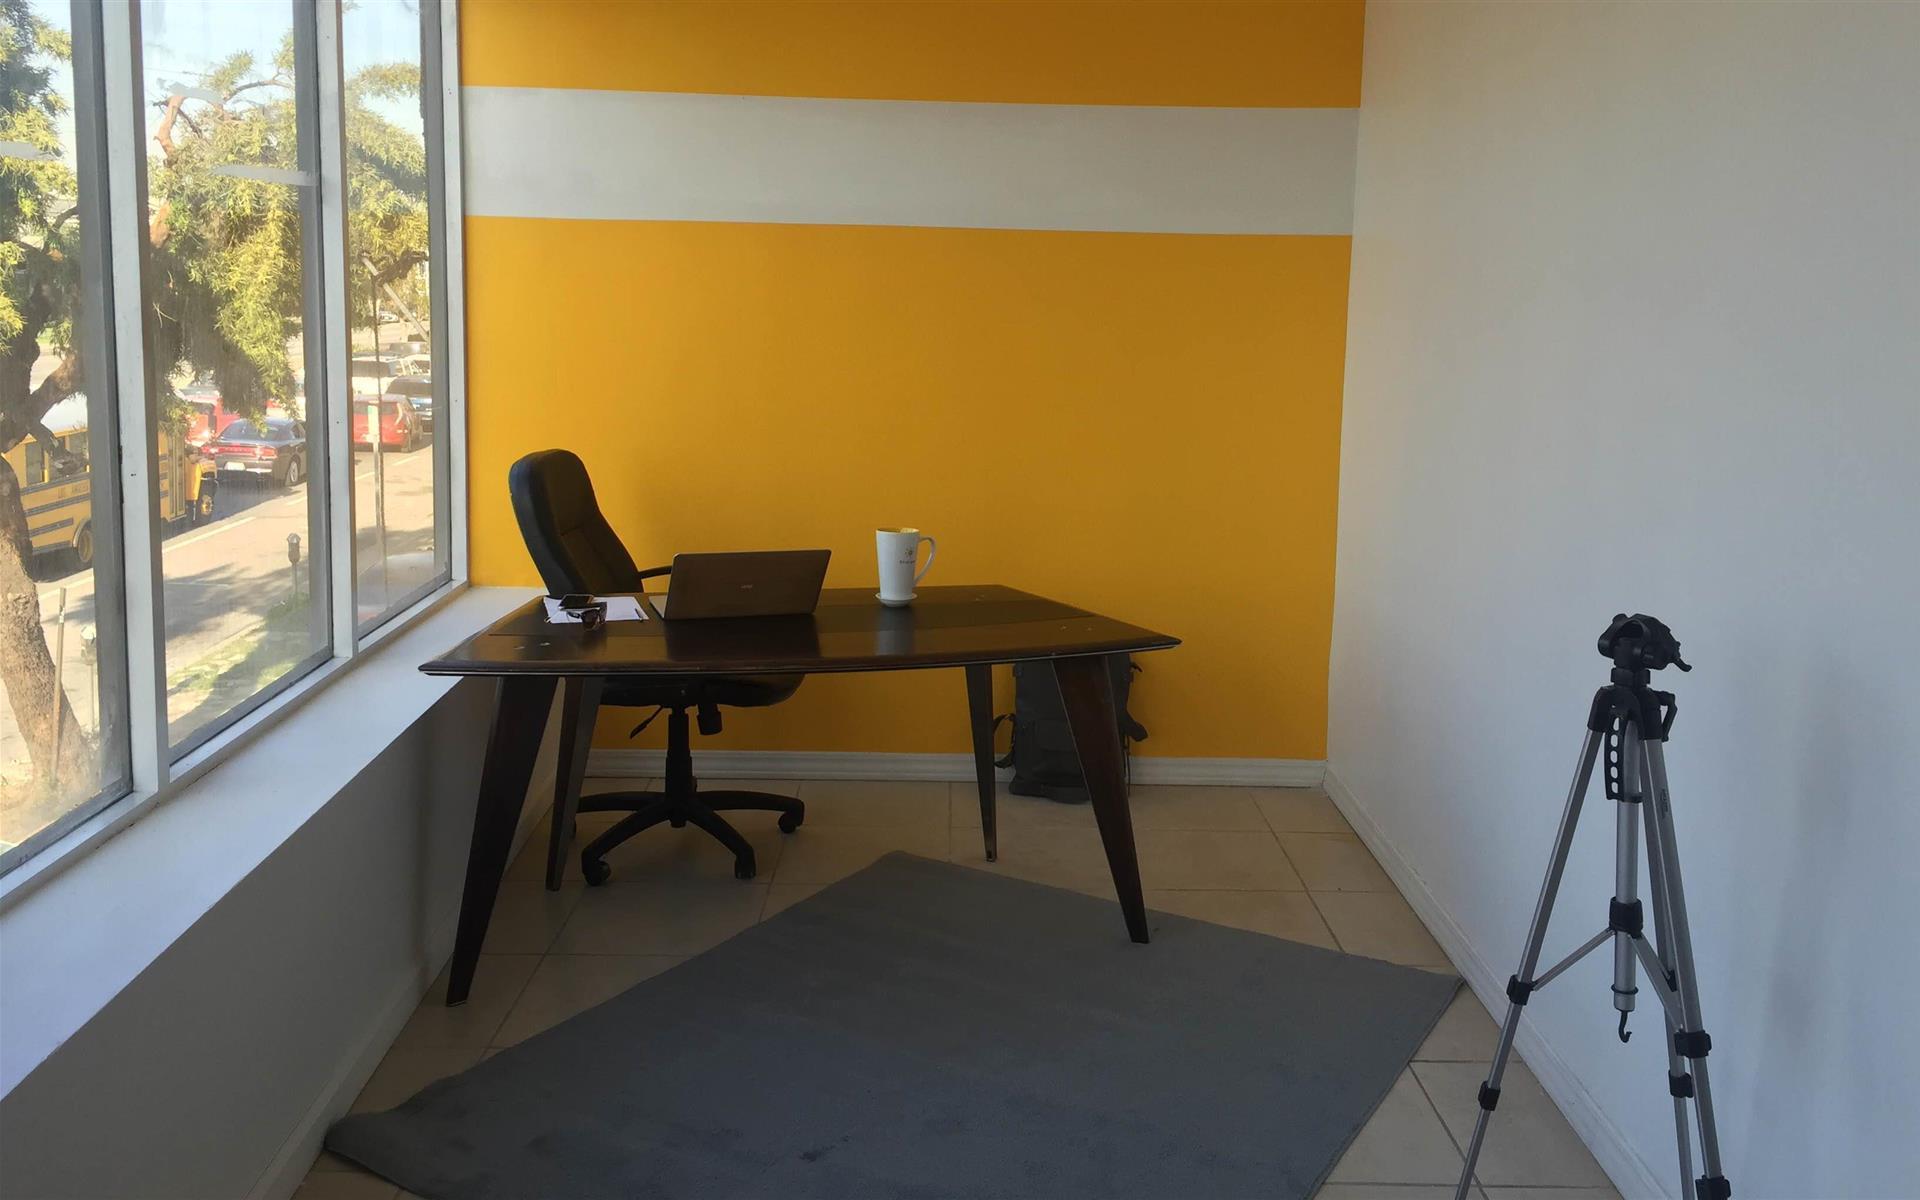 Quiet Office Space - Quiet Office Space - Dedicated Desk